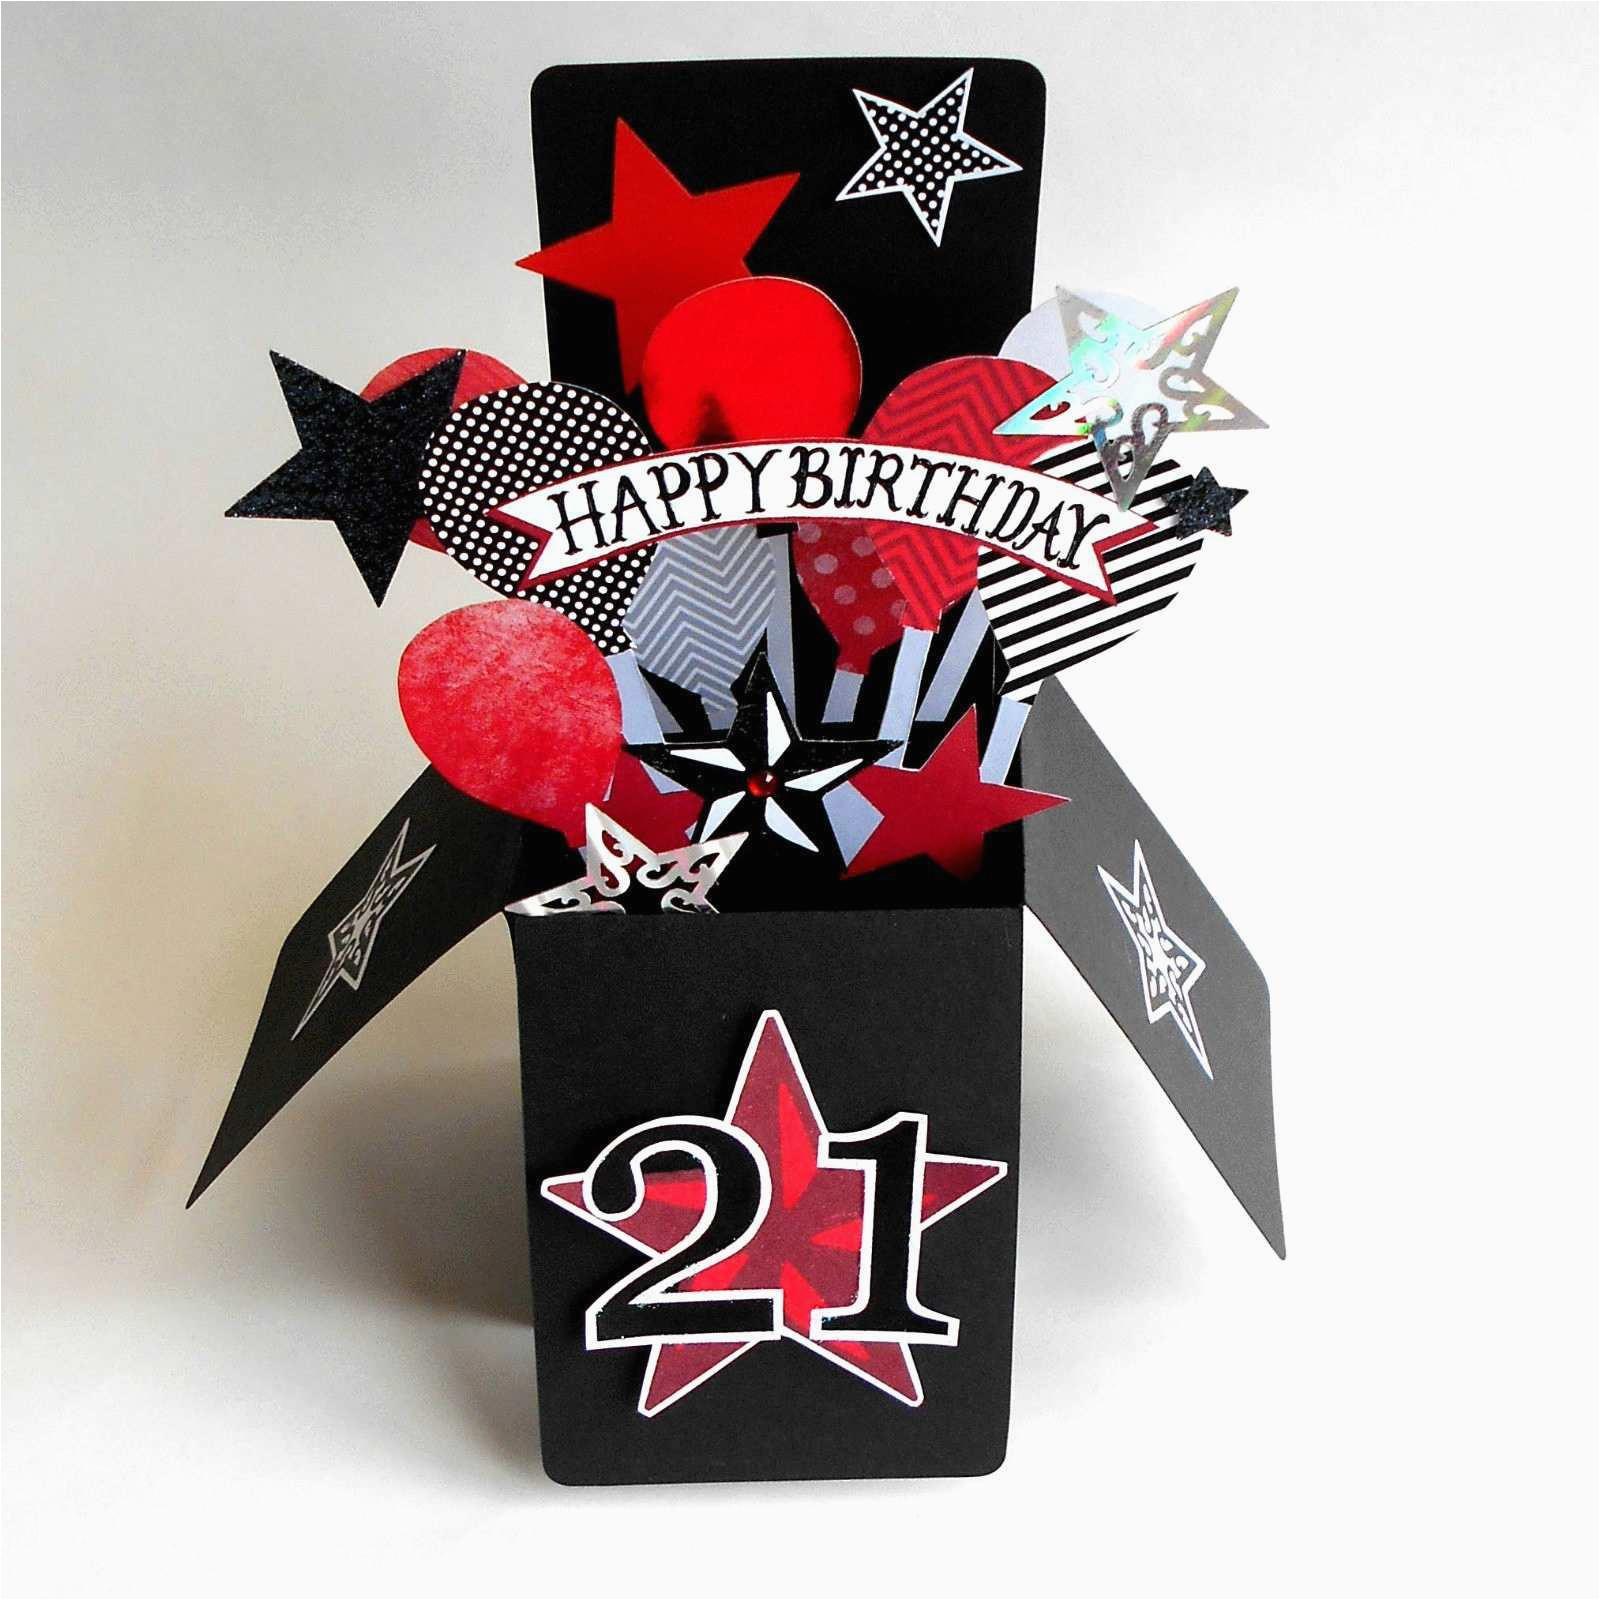 Custom Singing Birthday Cards Music Lovely Card Luxury Pop Box Age Tattoo